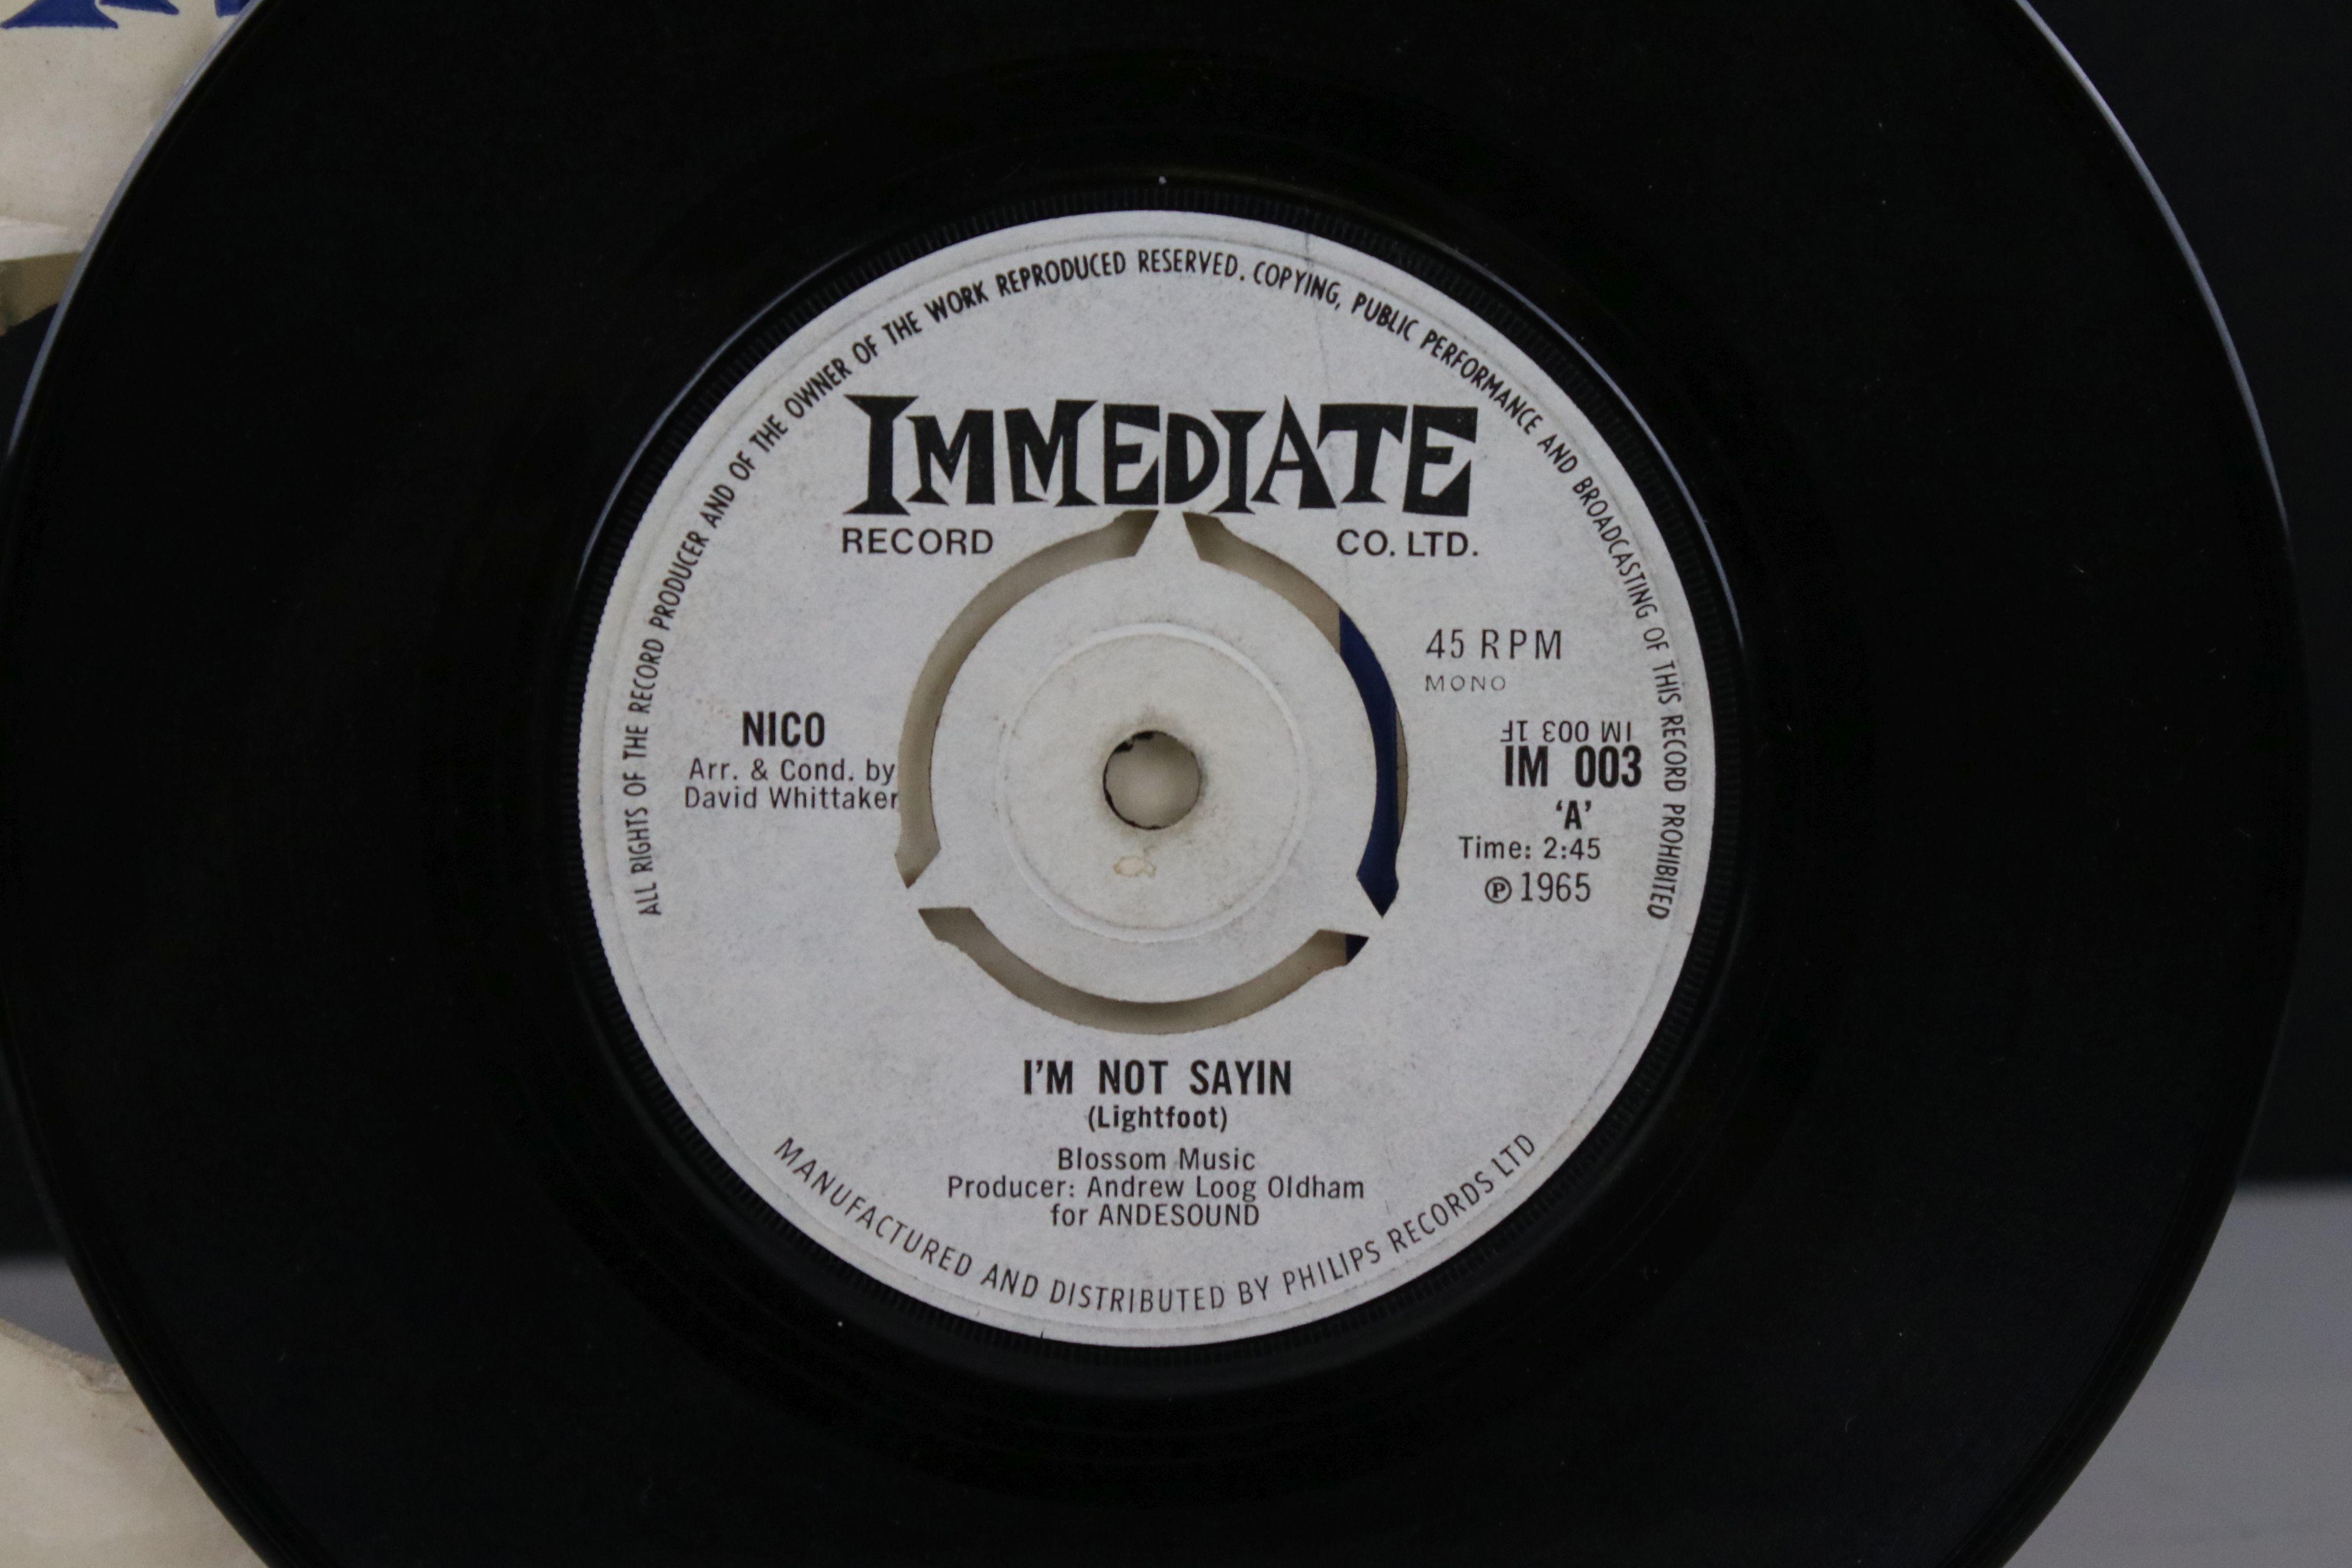 Vinyl - Nico I'm Not Sayin / The Last Mile 45 on Immediate IM003 in company sleeve, vg - Image 2 of 5